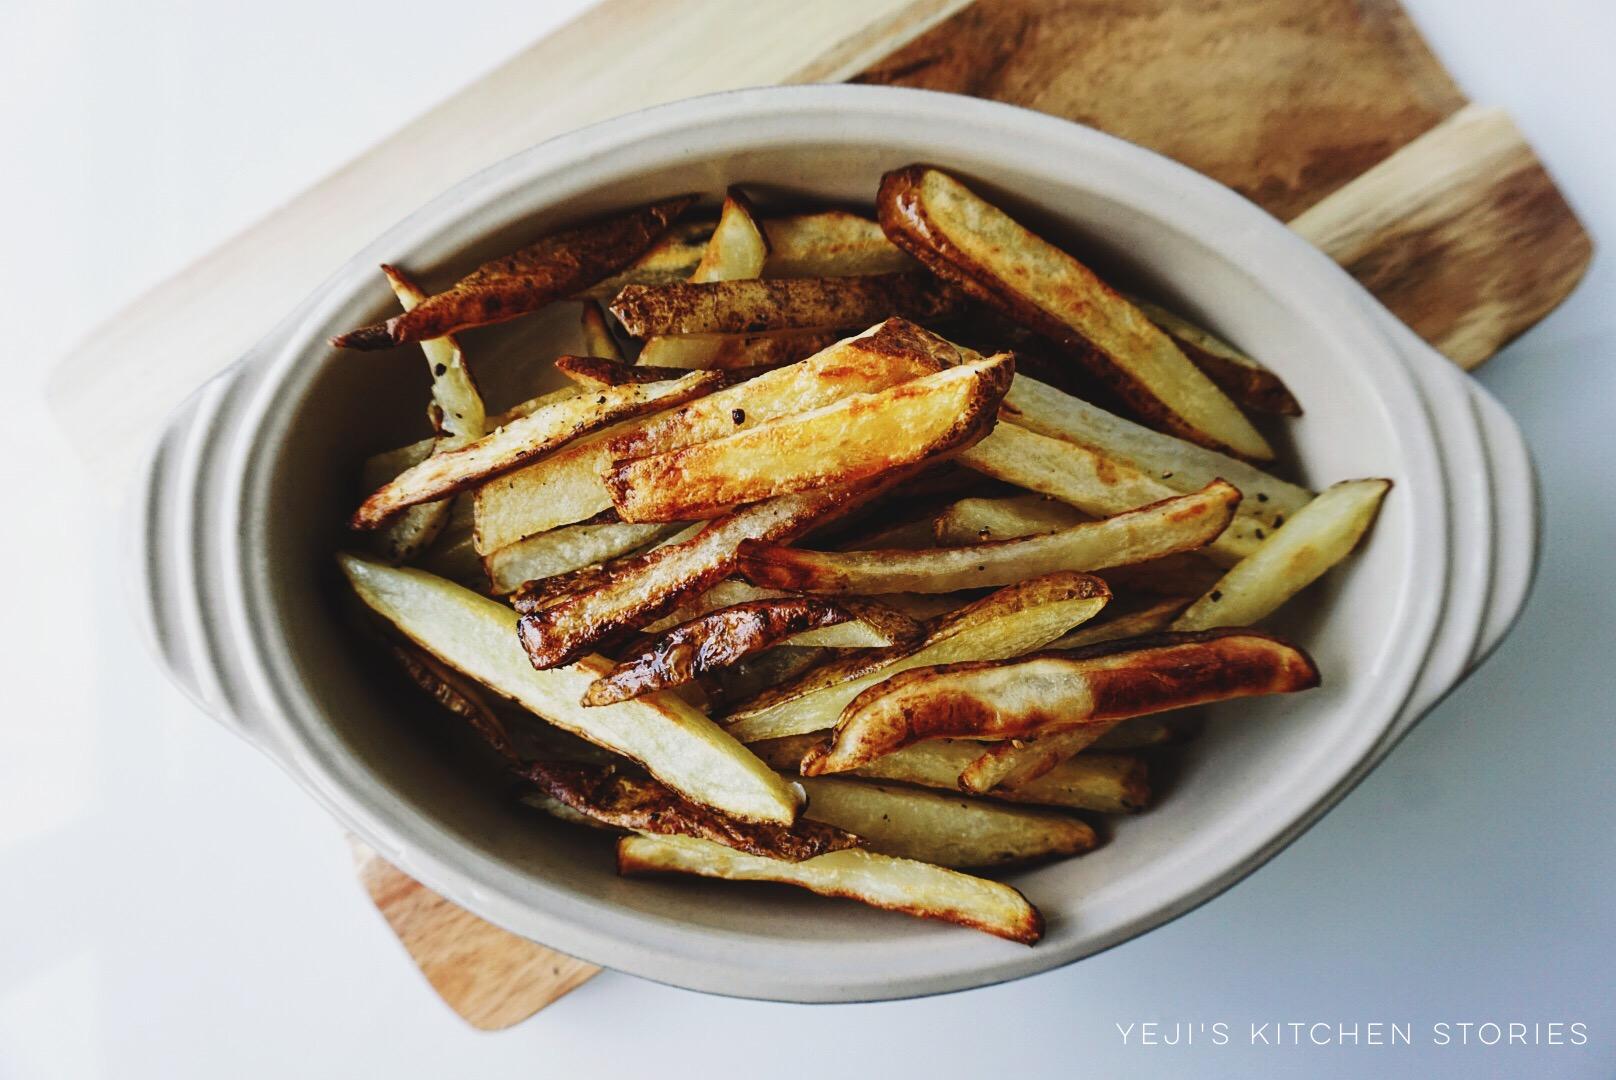 oven-baked-truffle-fries-caramelized-onions-shiitake-mushrooms